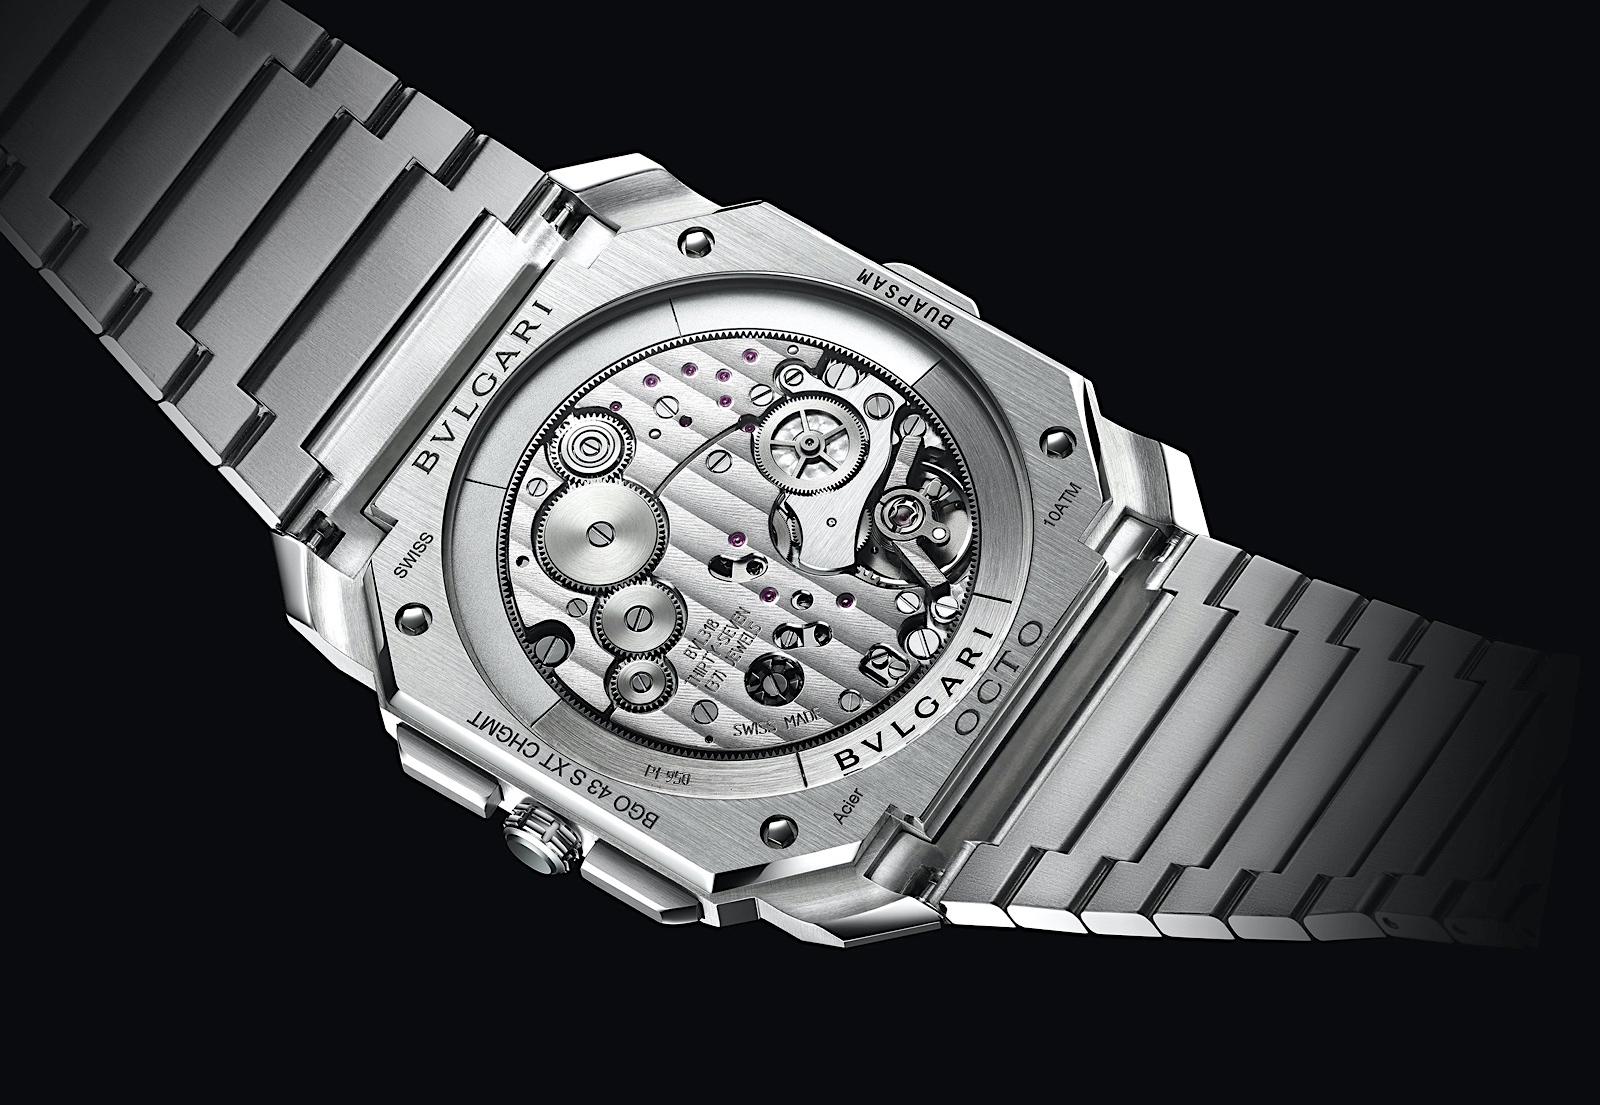 Bvlgari Octo Finissimo S Chronograph GMT - caseback